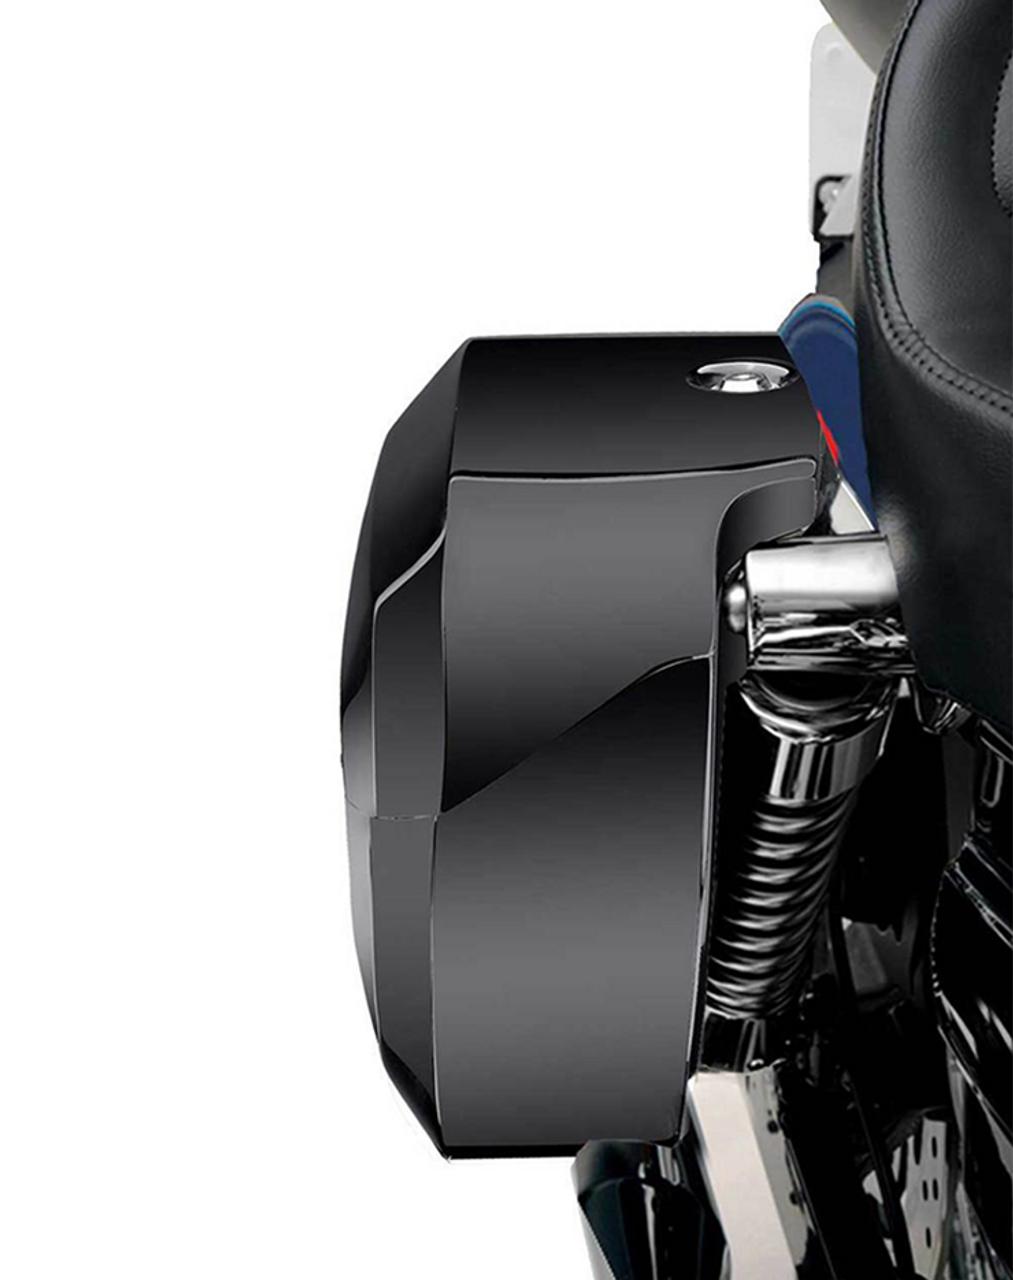 Honda VTX 1800 C Viking Lamellar Extra Large Shock Cutout Saddlebag shock cutout view